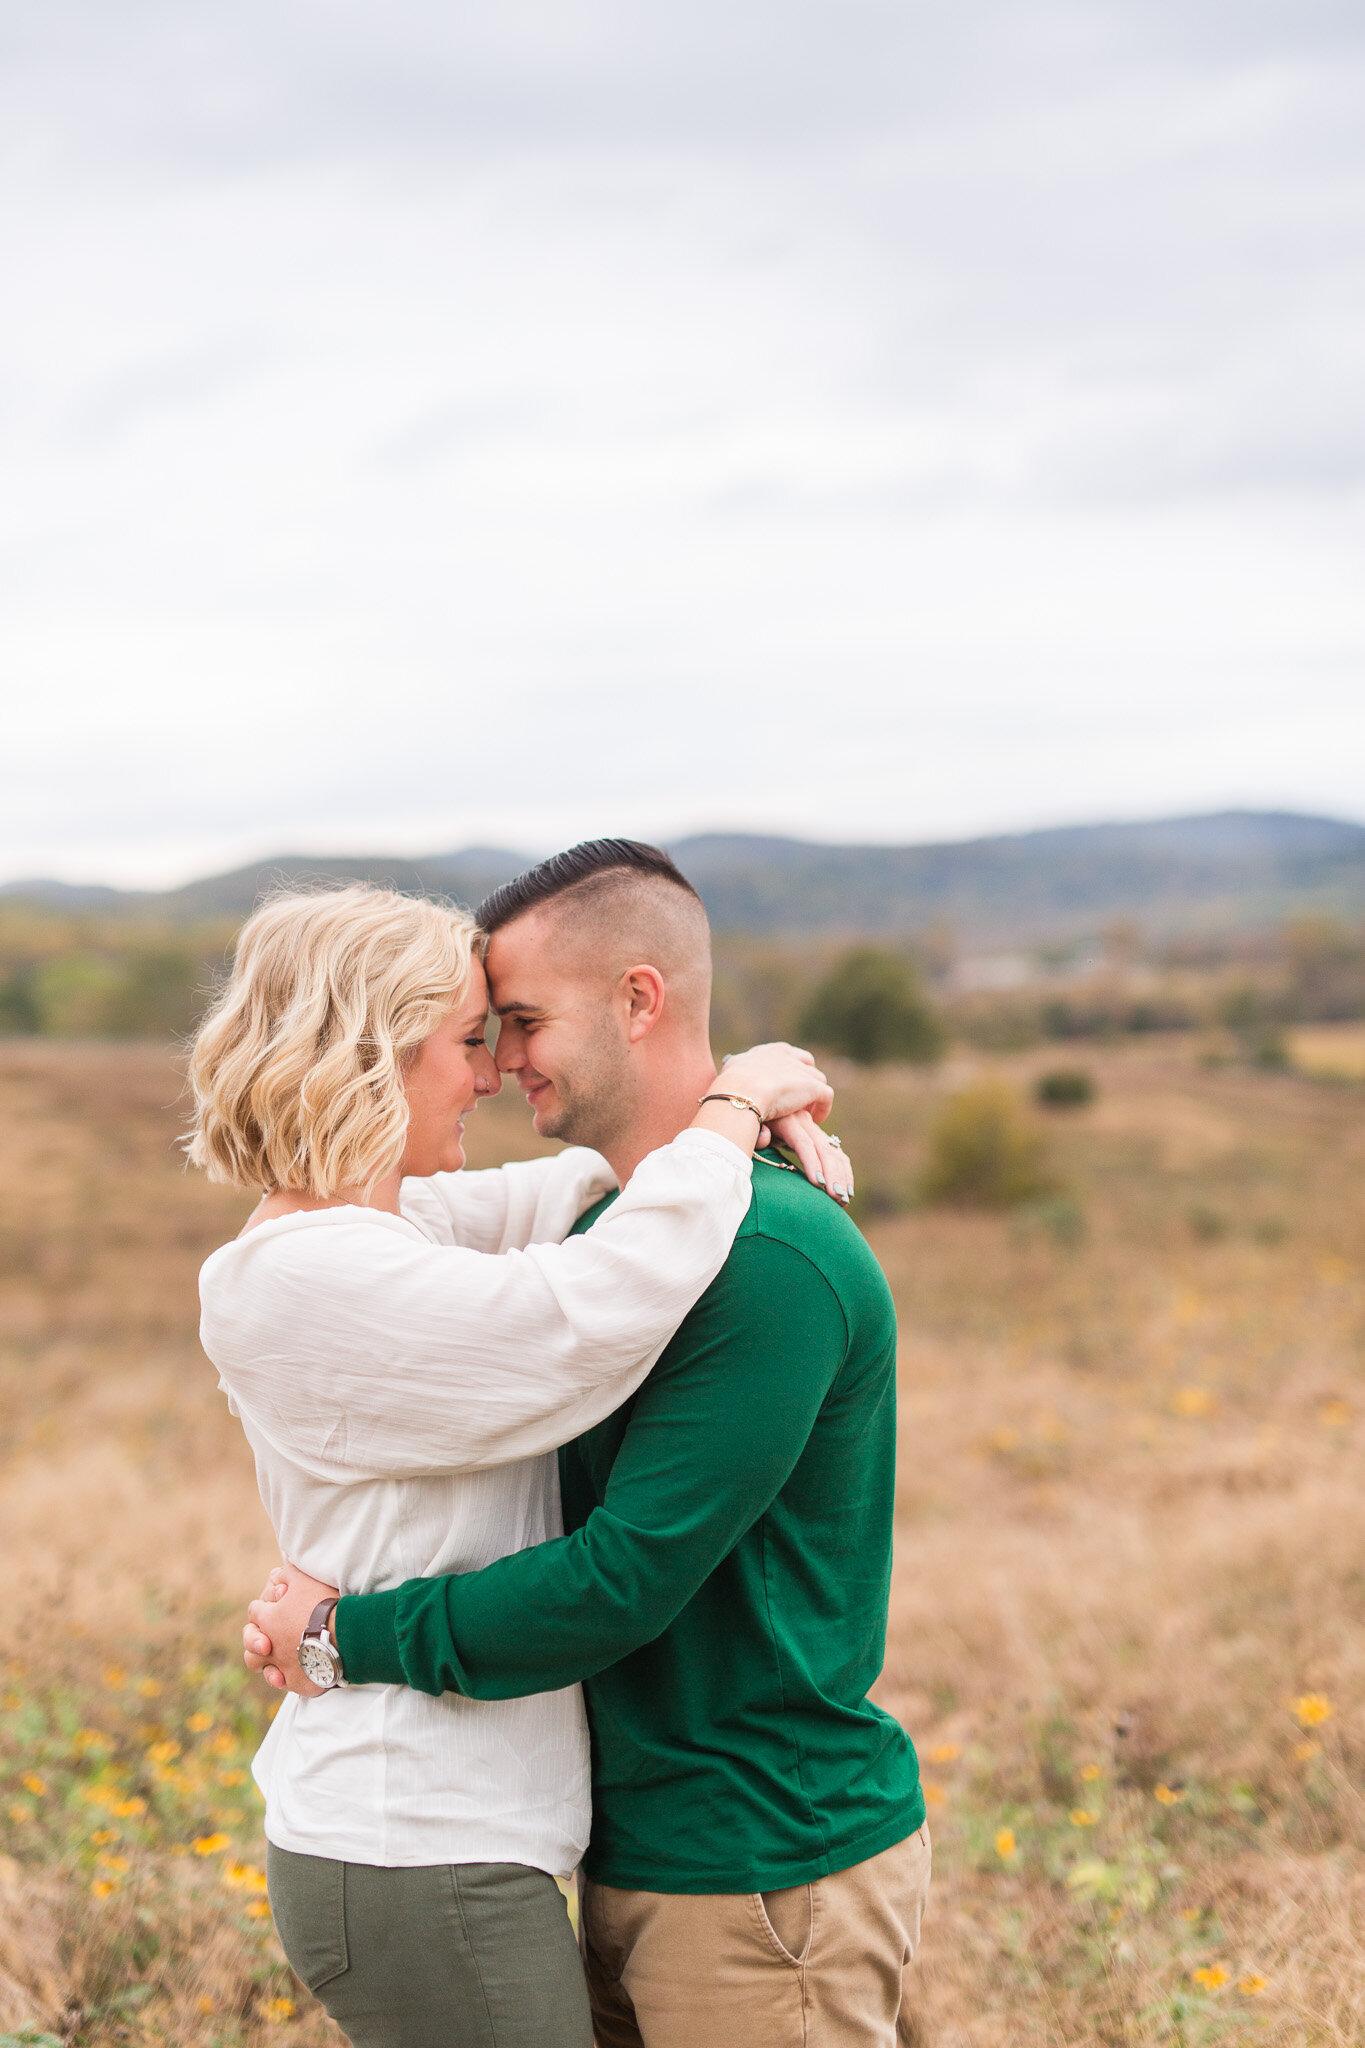 Fall Mountain Engagement Session in Lynchburg, Virginia || Lynchburg Wedding and Portrait Photographer